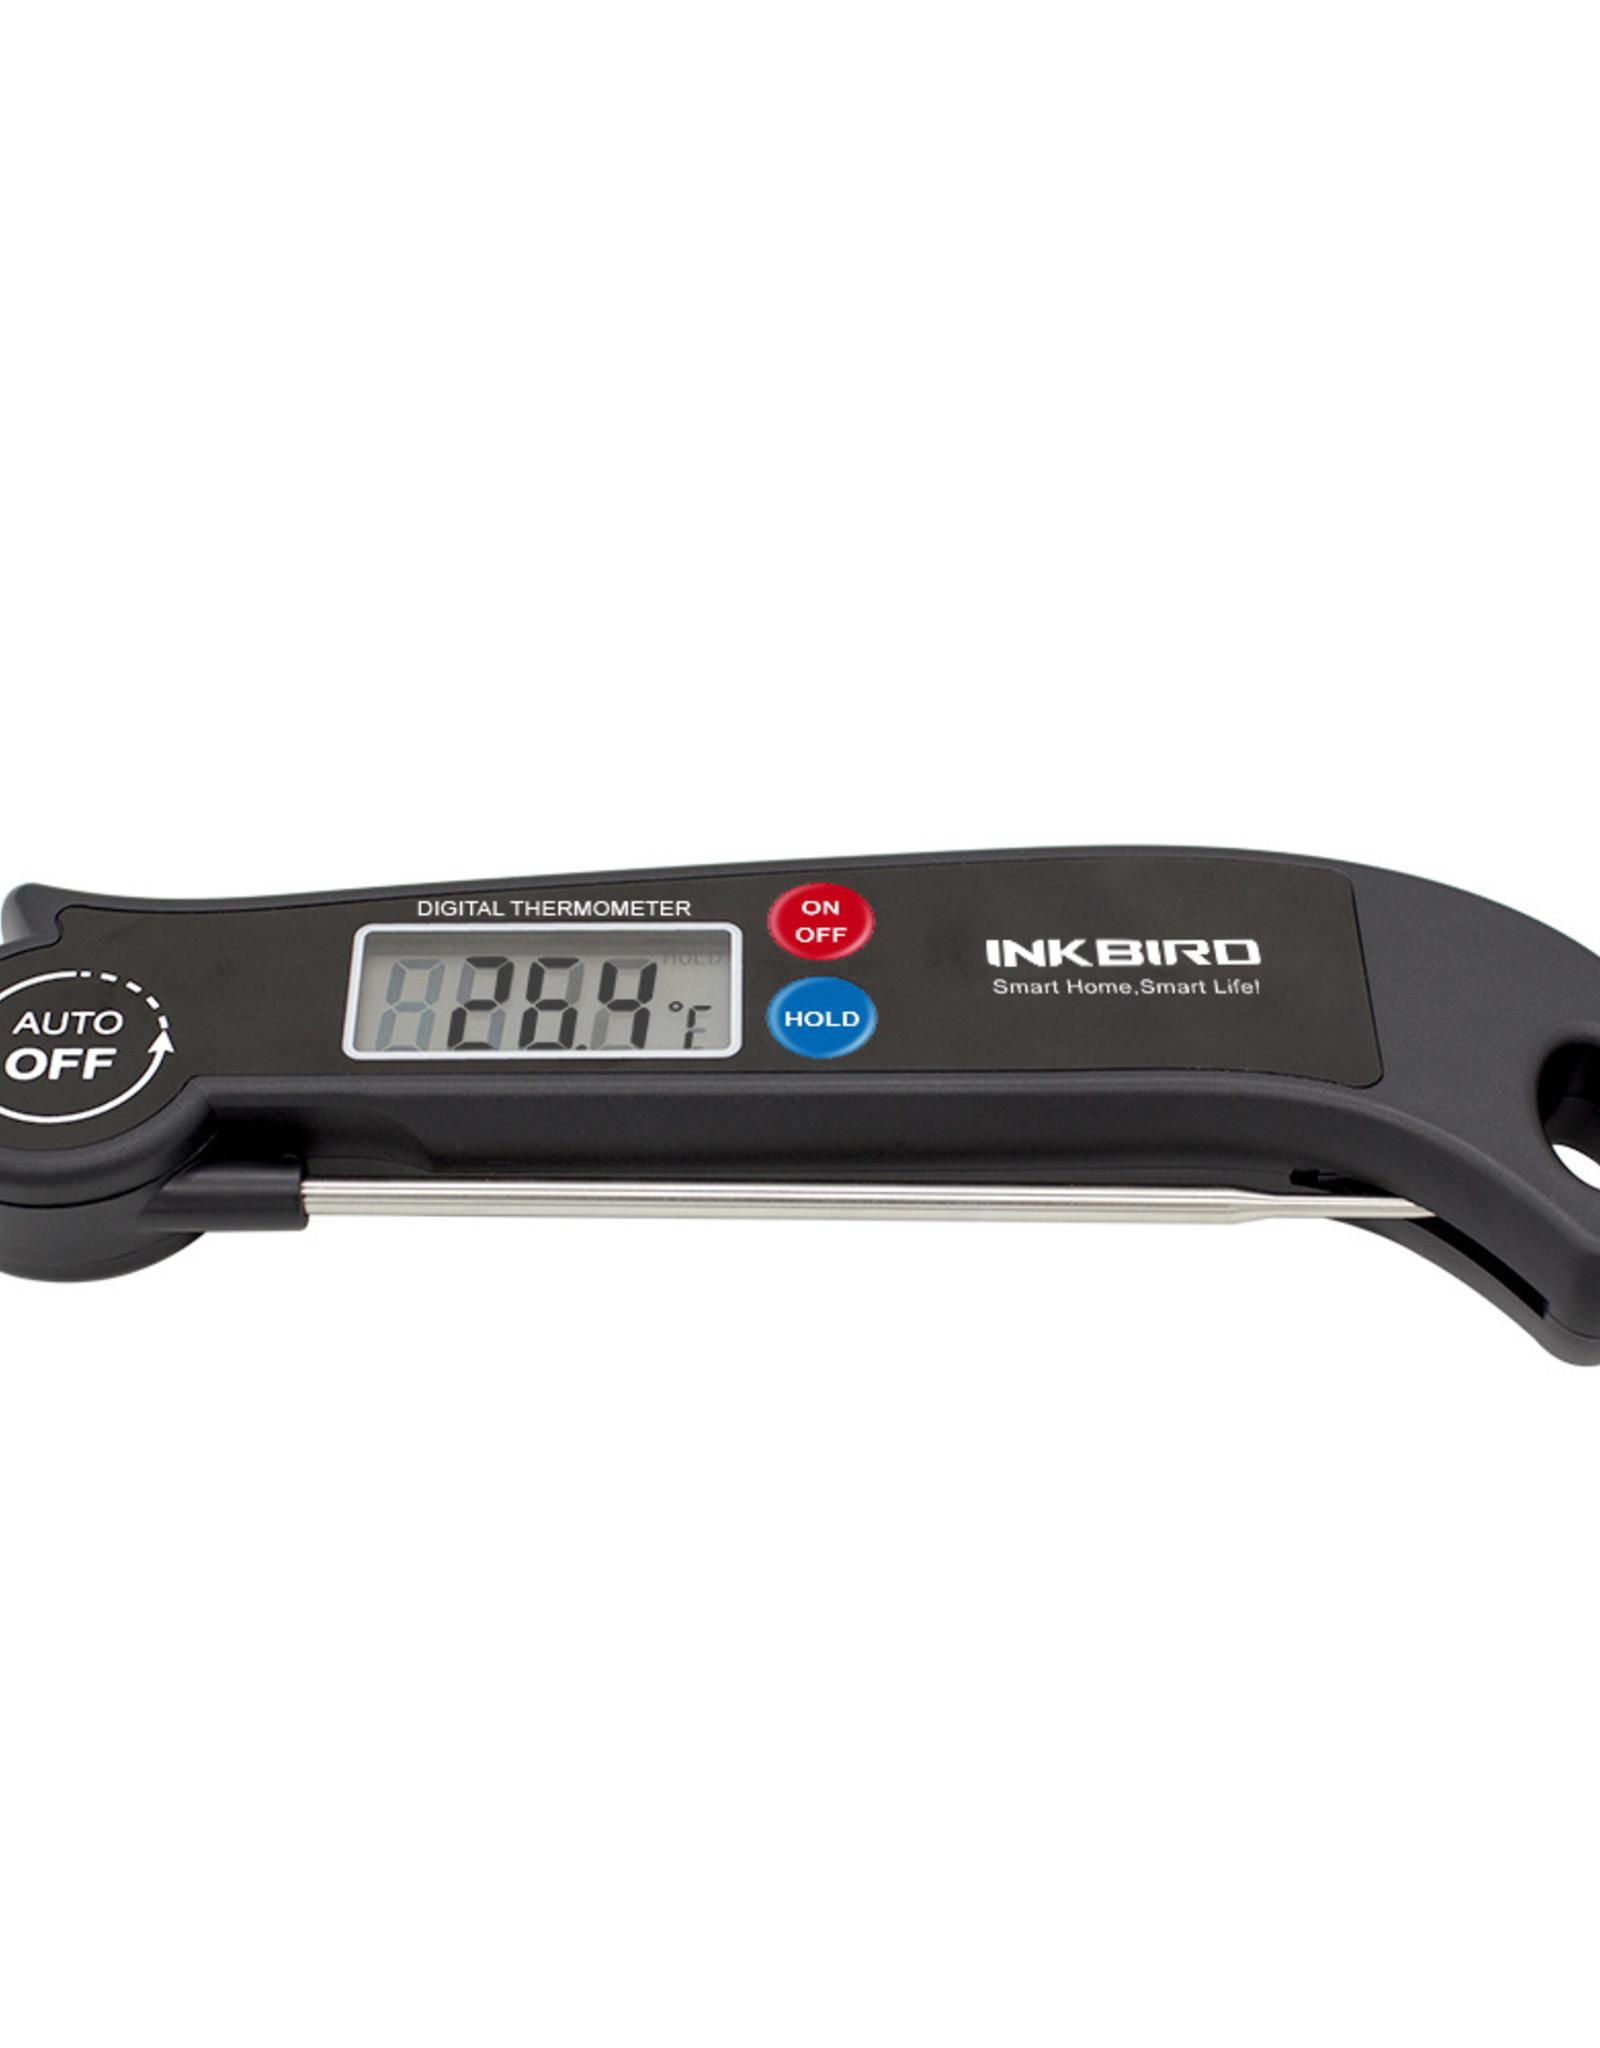 Inkbird Inkbird HET-F001 digitale thermometer